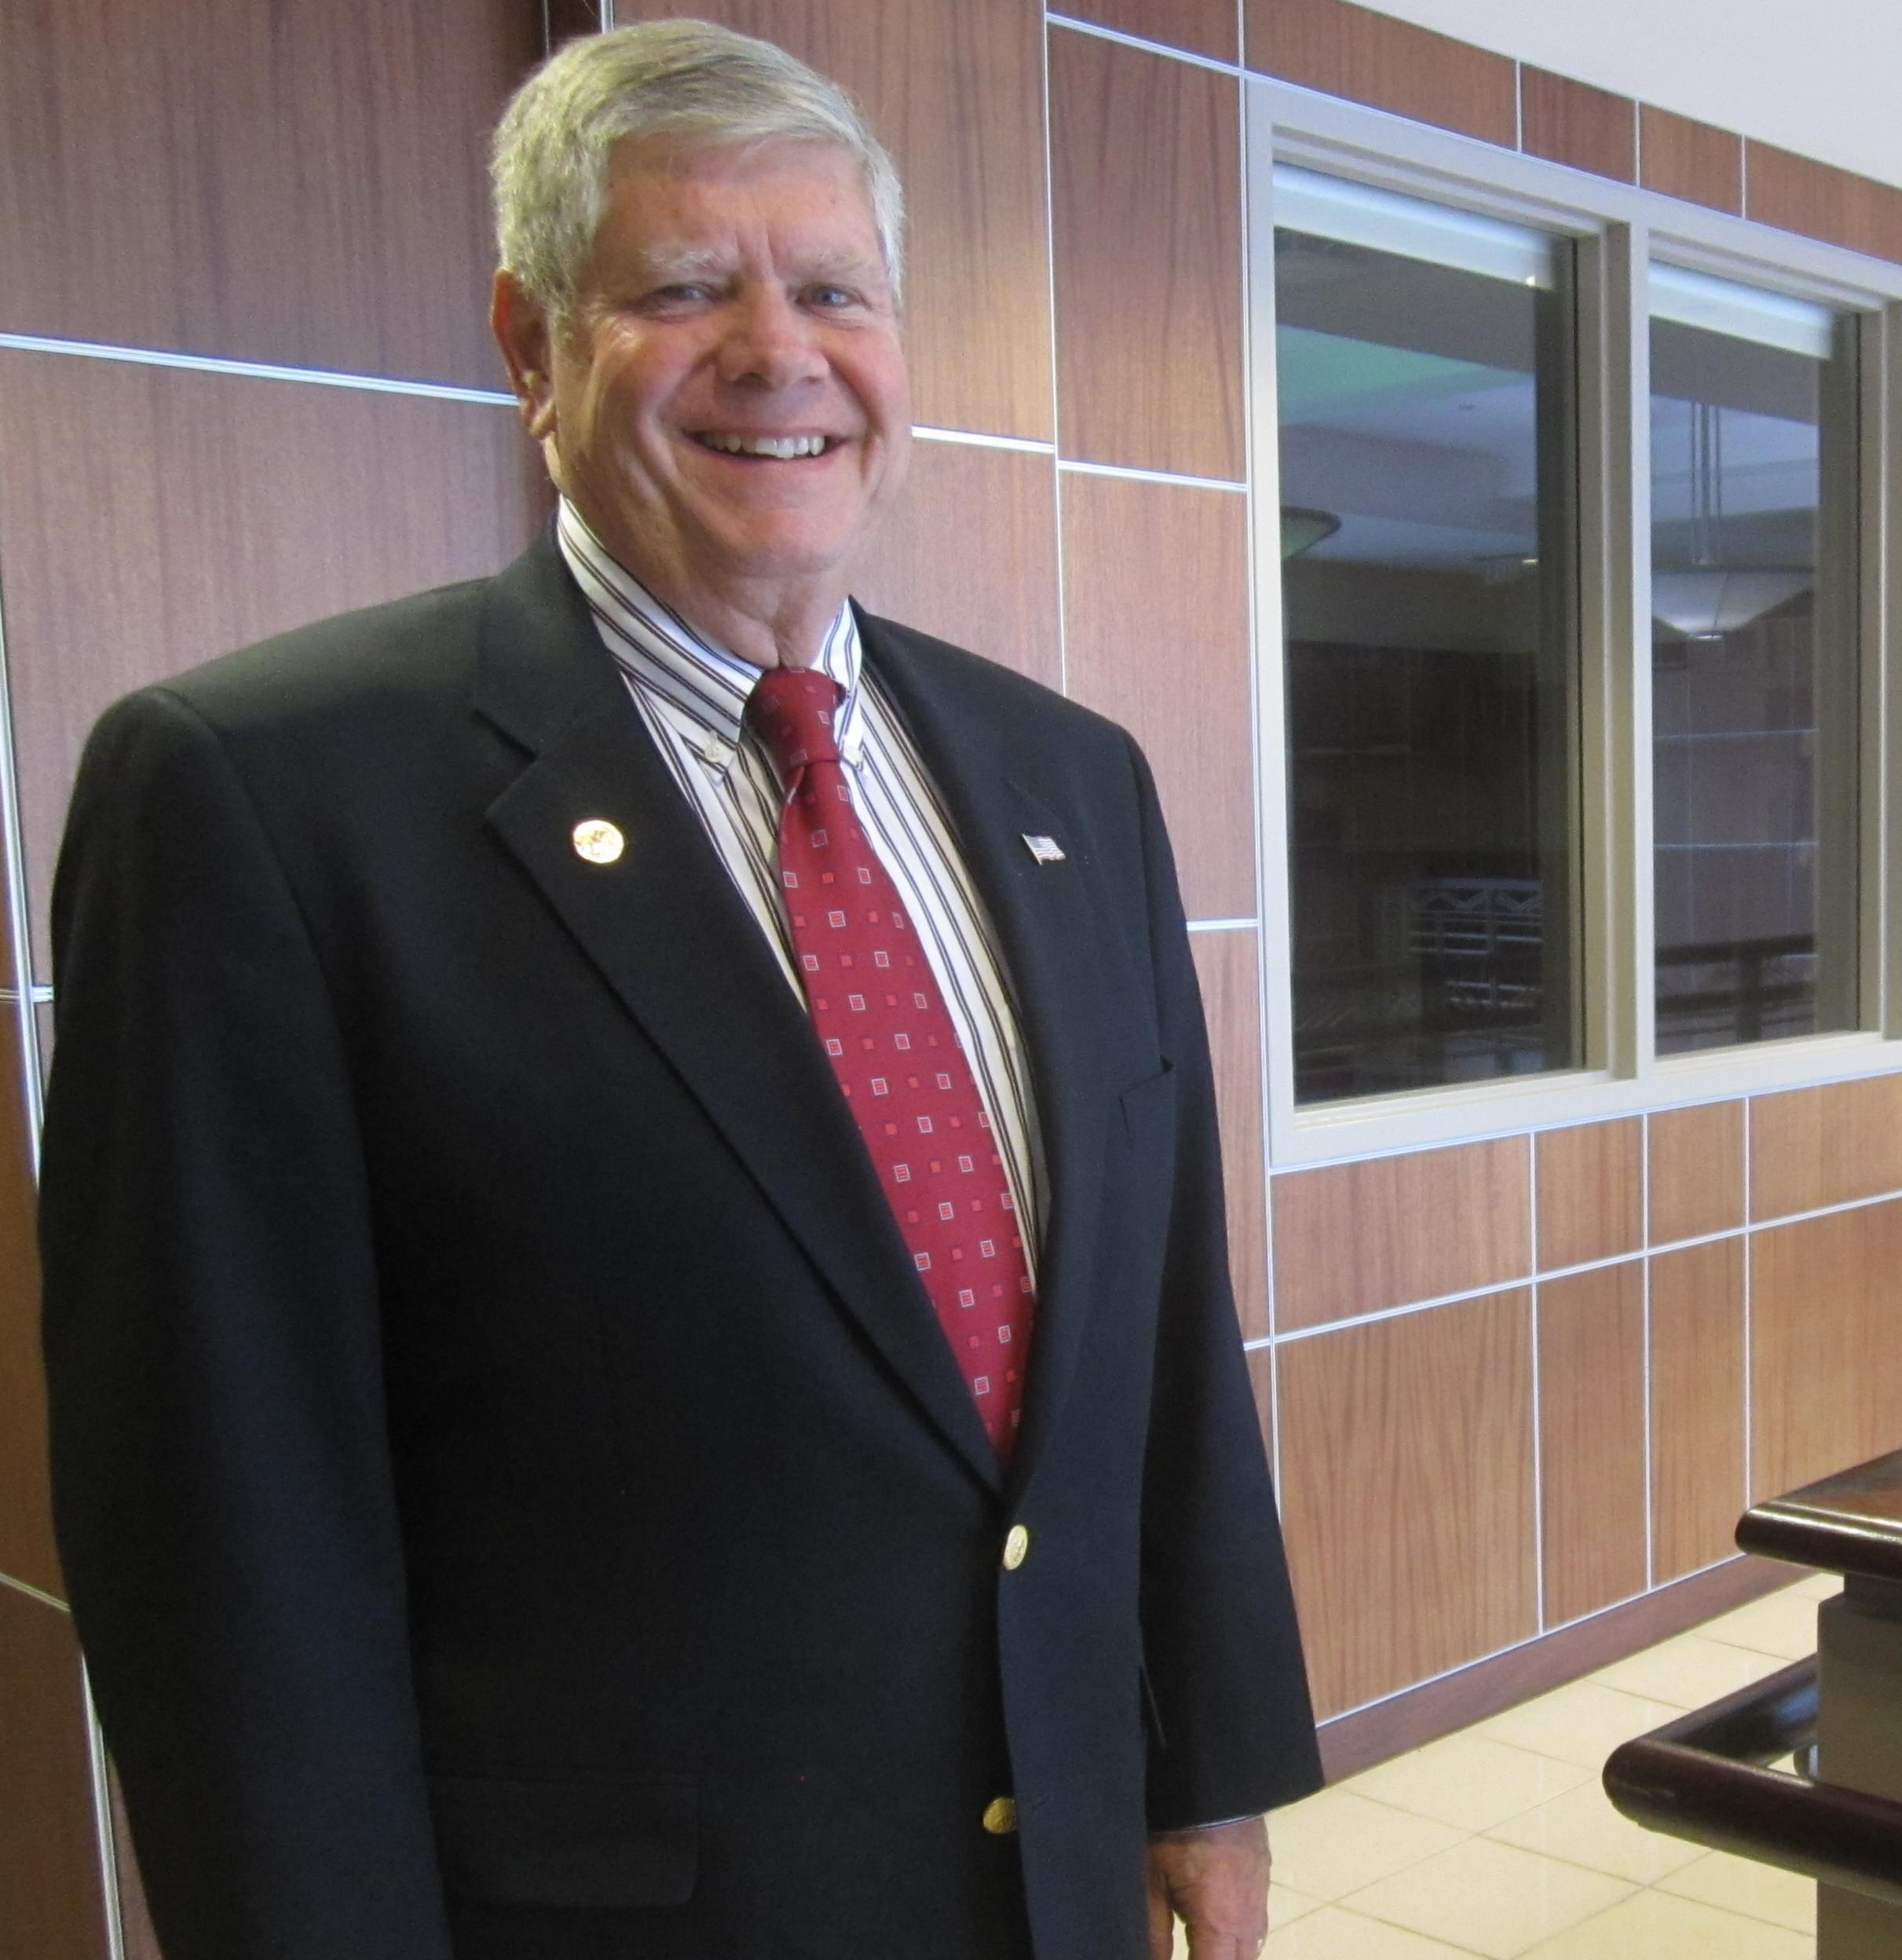 State Senator and dairy owner Jim Oberweis, Republican candidate for U-S Senate in Illinois.